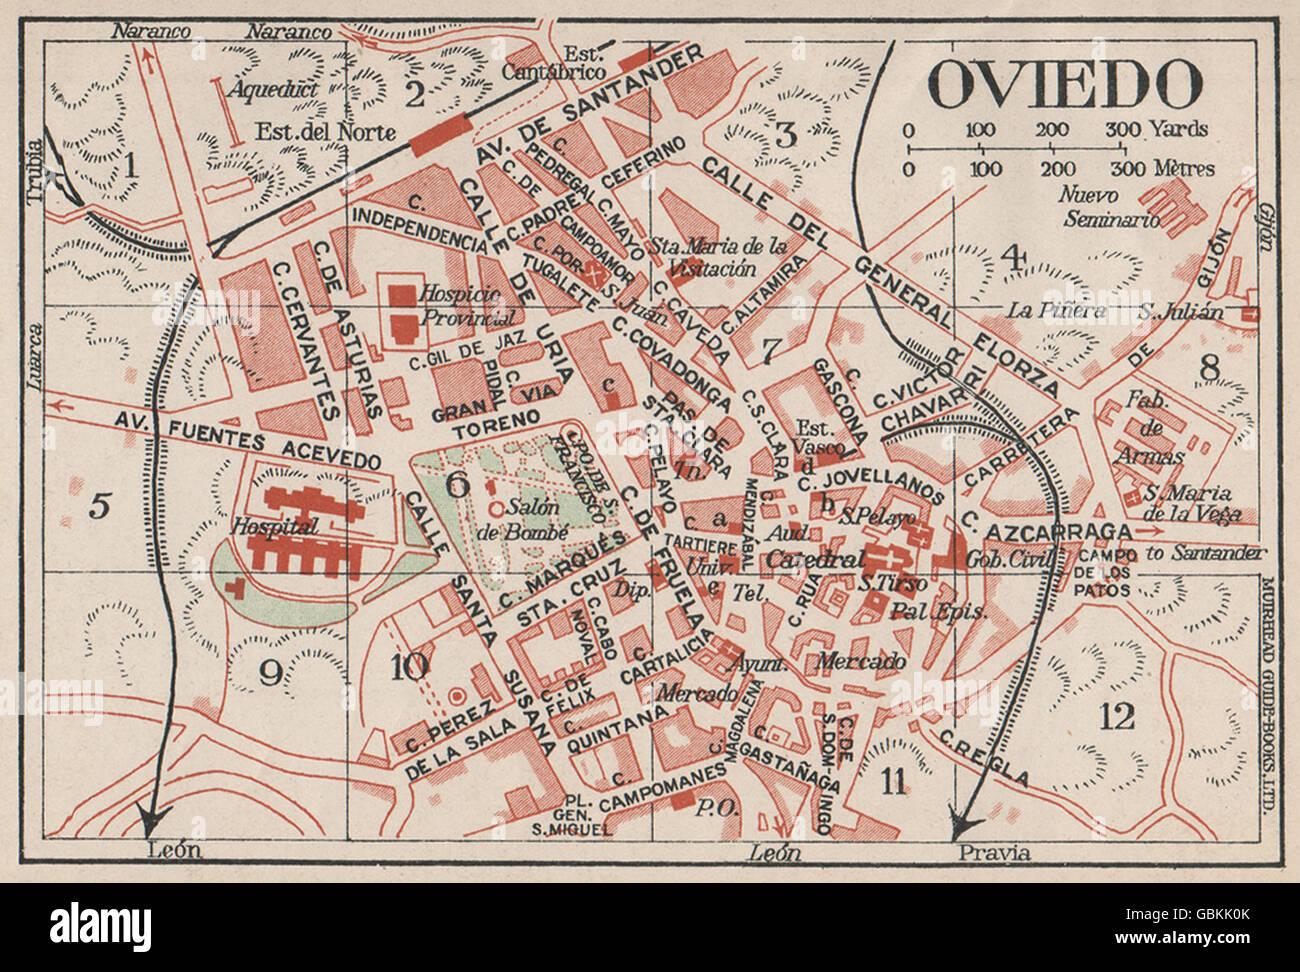 Mappa Spagna Oviedo.Oviedo Vintage Town Mappa Della Citta Piano Spagna 1930 Foto Stock Alamy